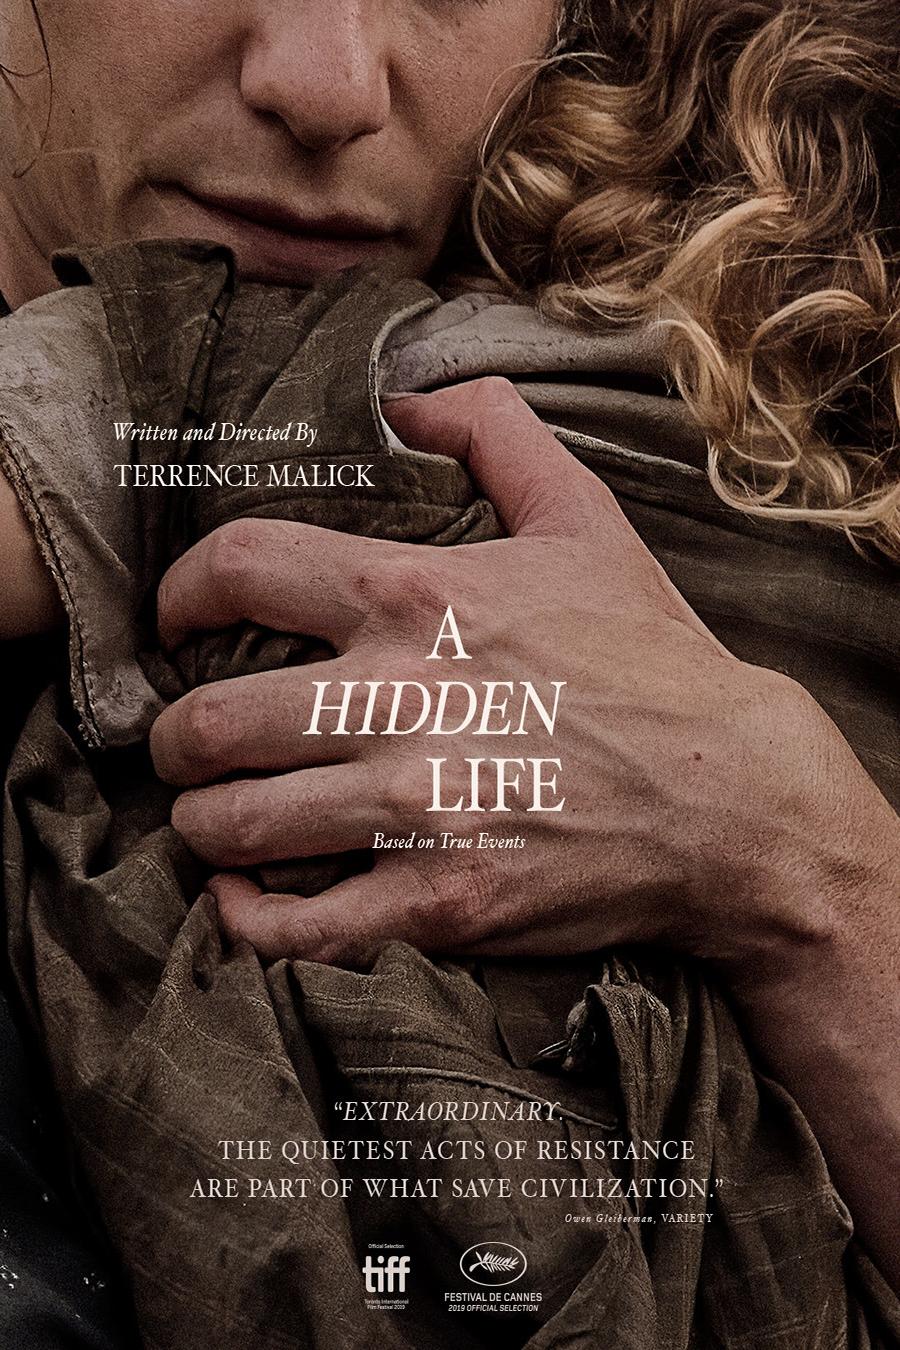 Poster for A Hidden Life